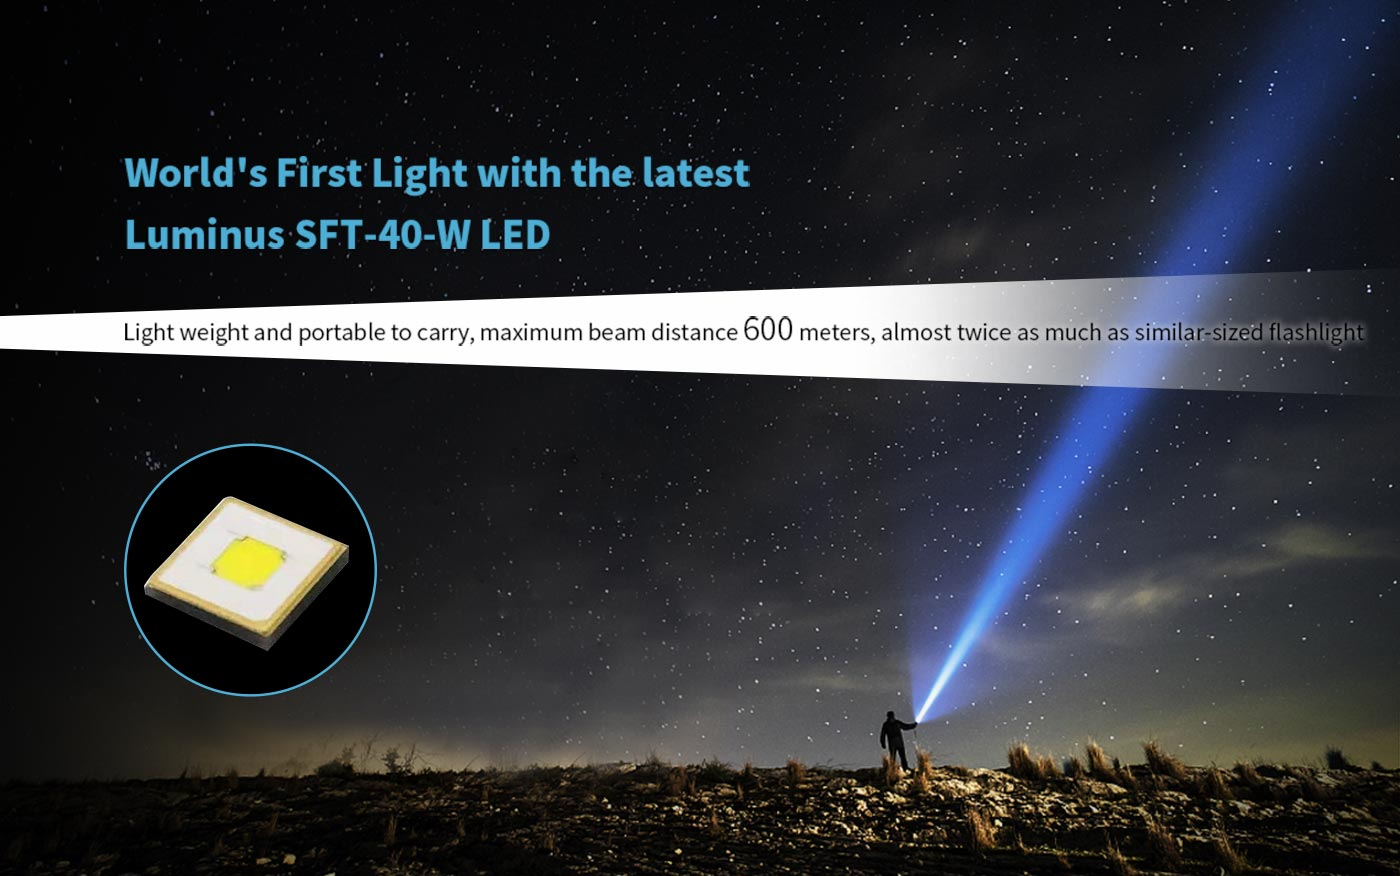 pro tactical led flashlight, super long range led flashlight, led flashlight tactical